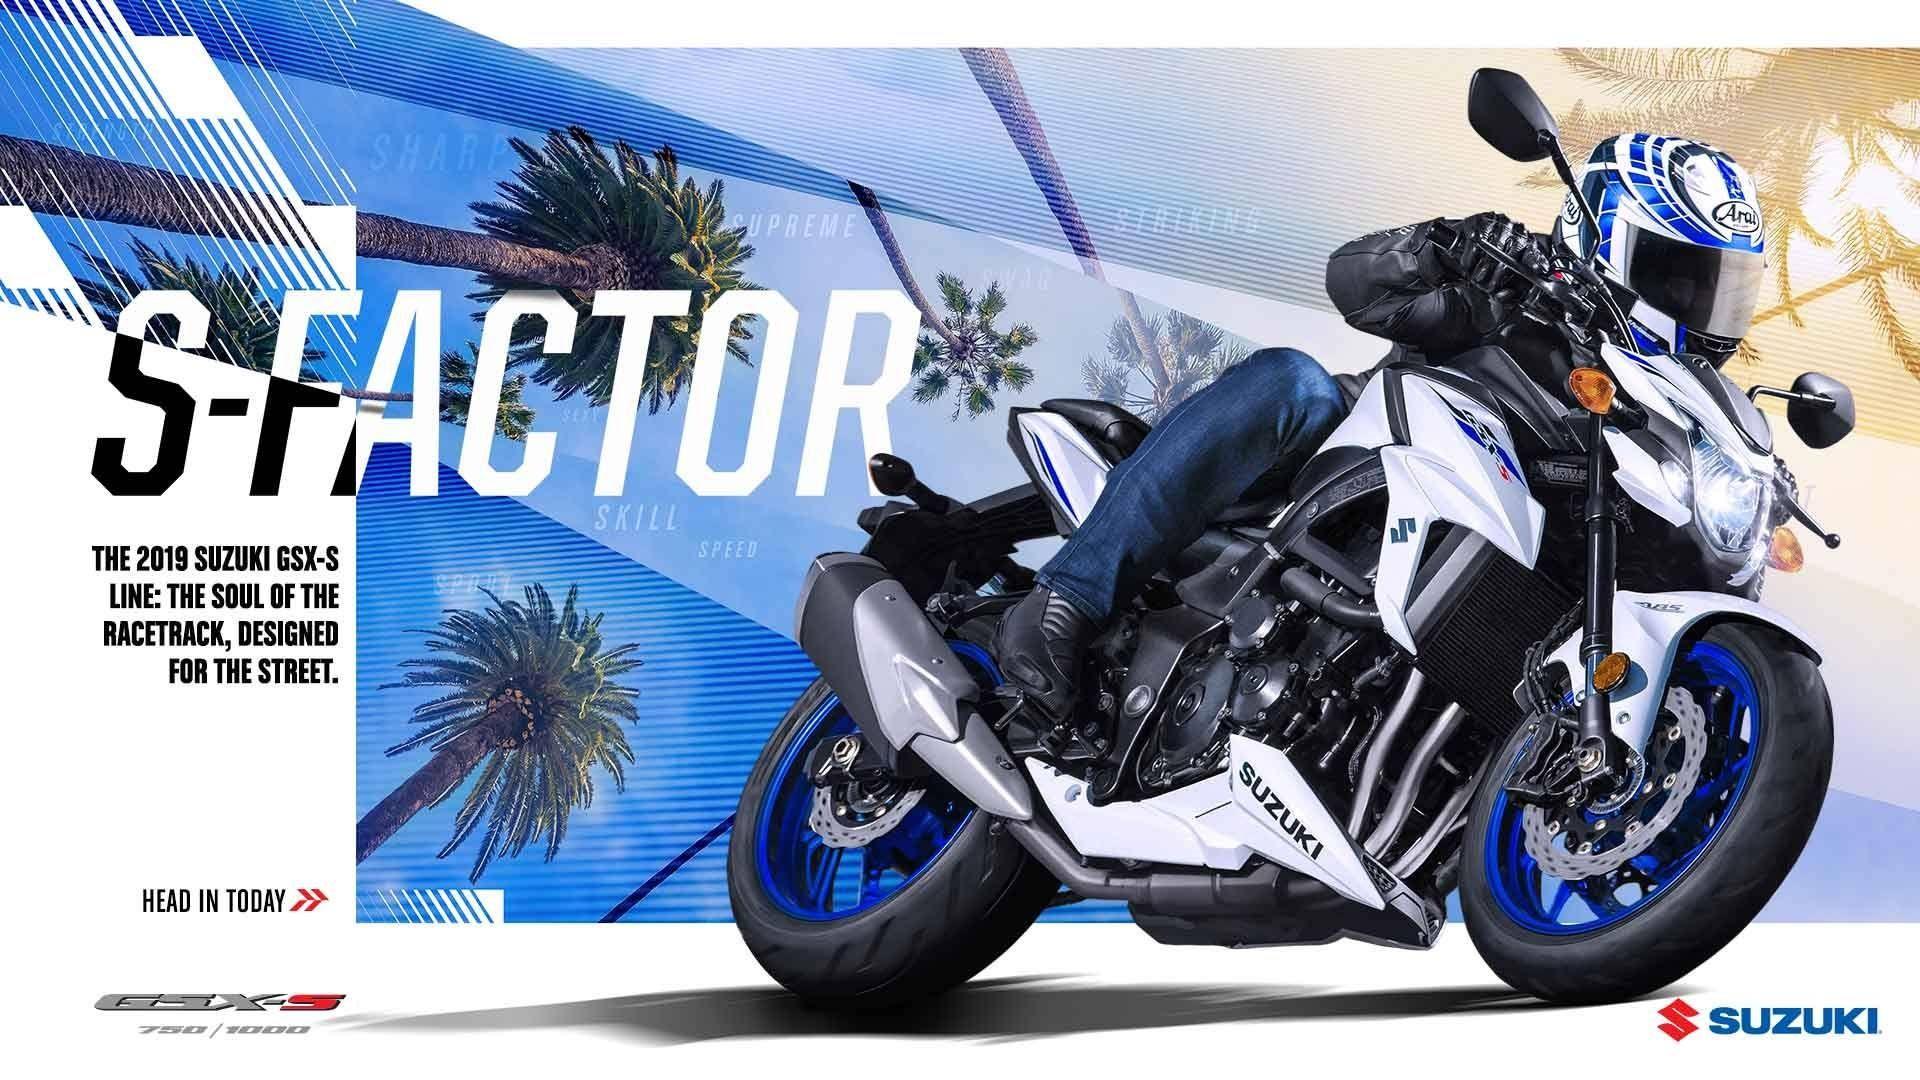 Suzuki Dealer Melbourne Florida Velocity Motorworx New And Used